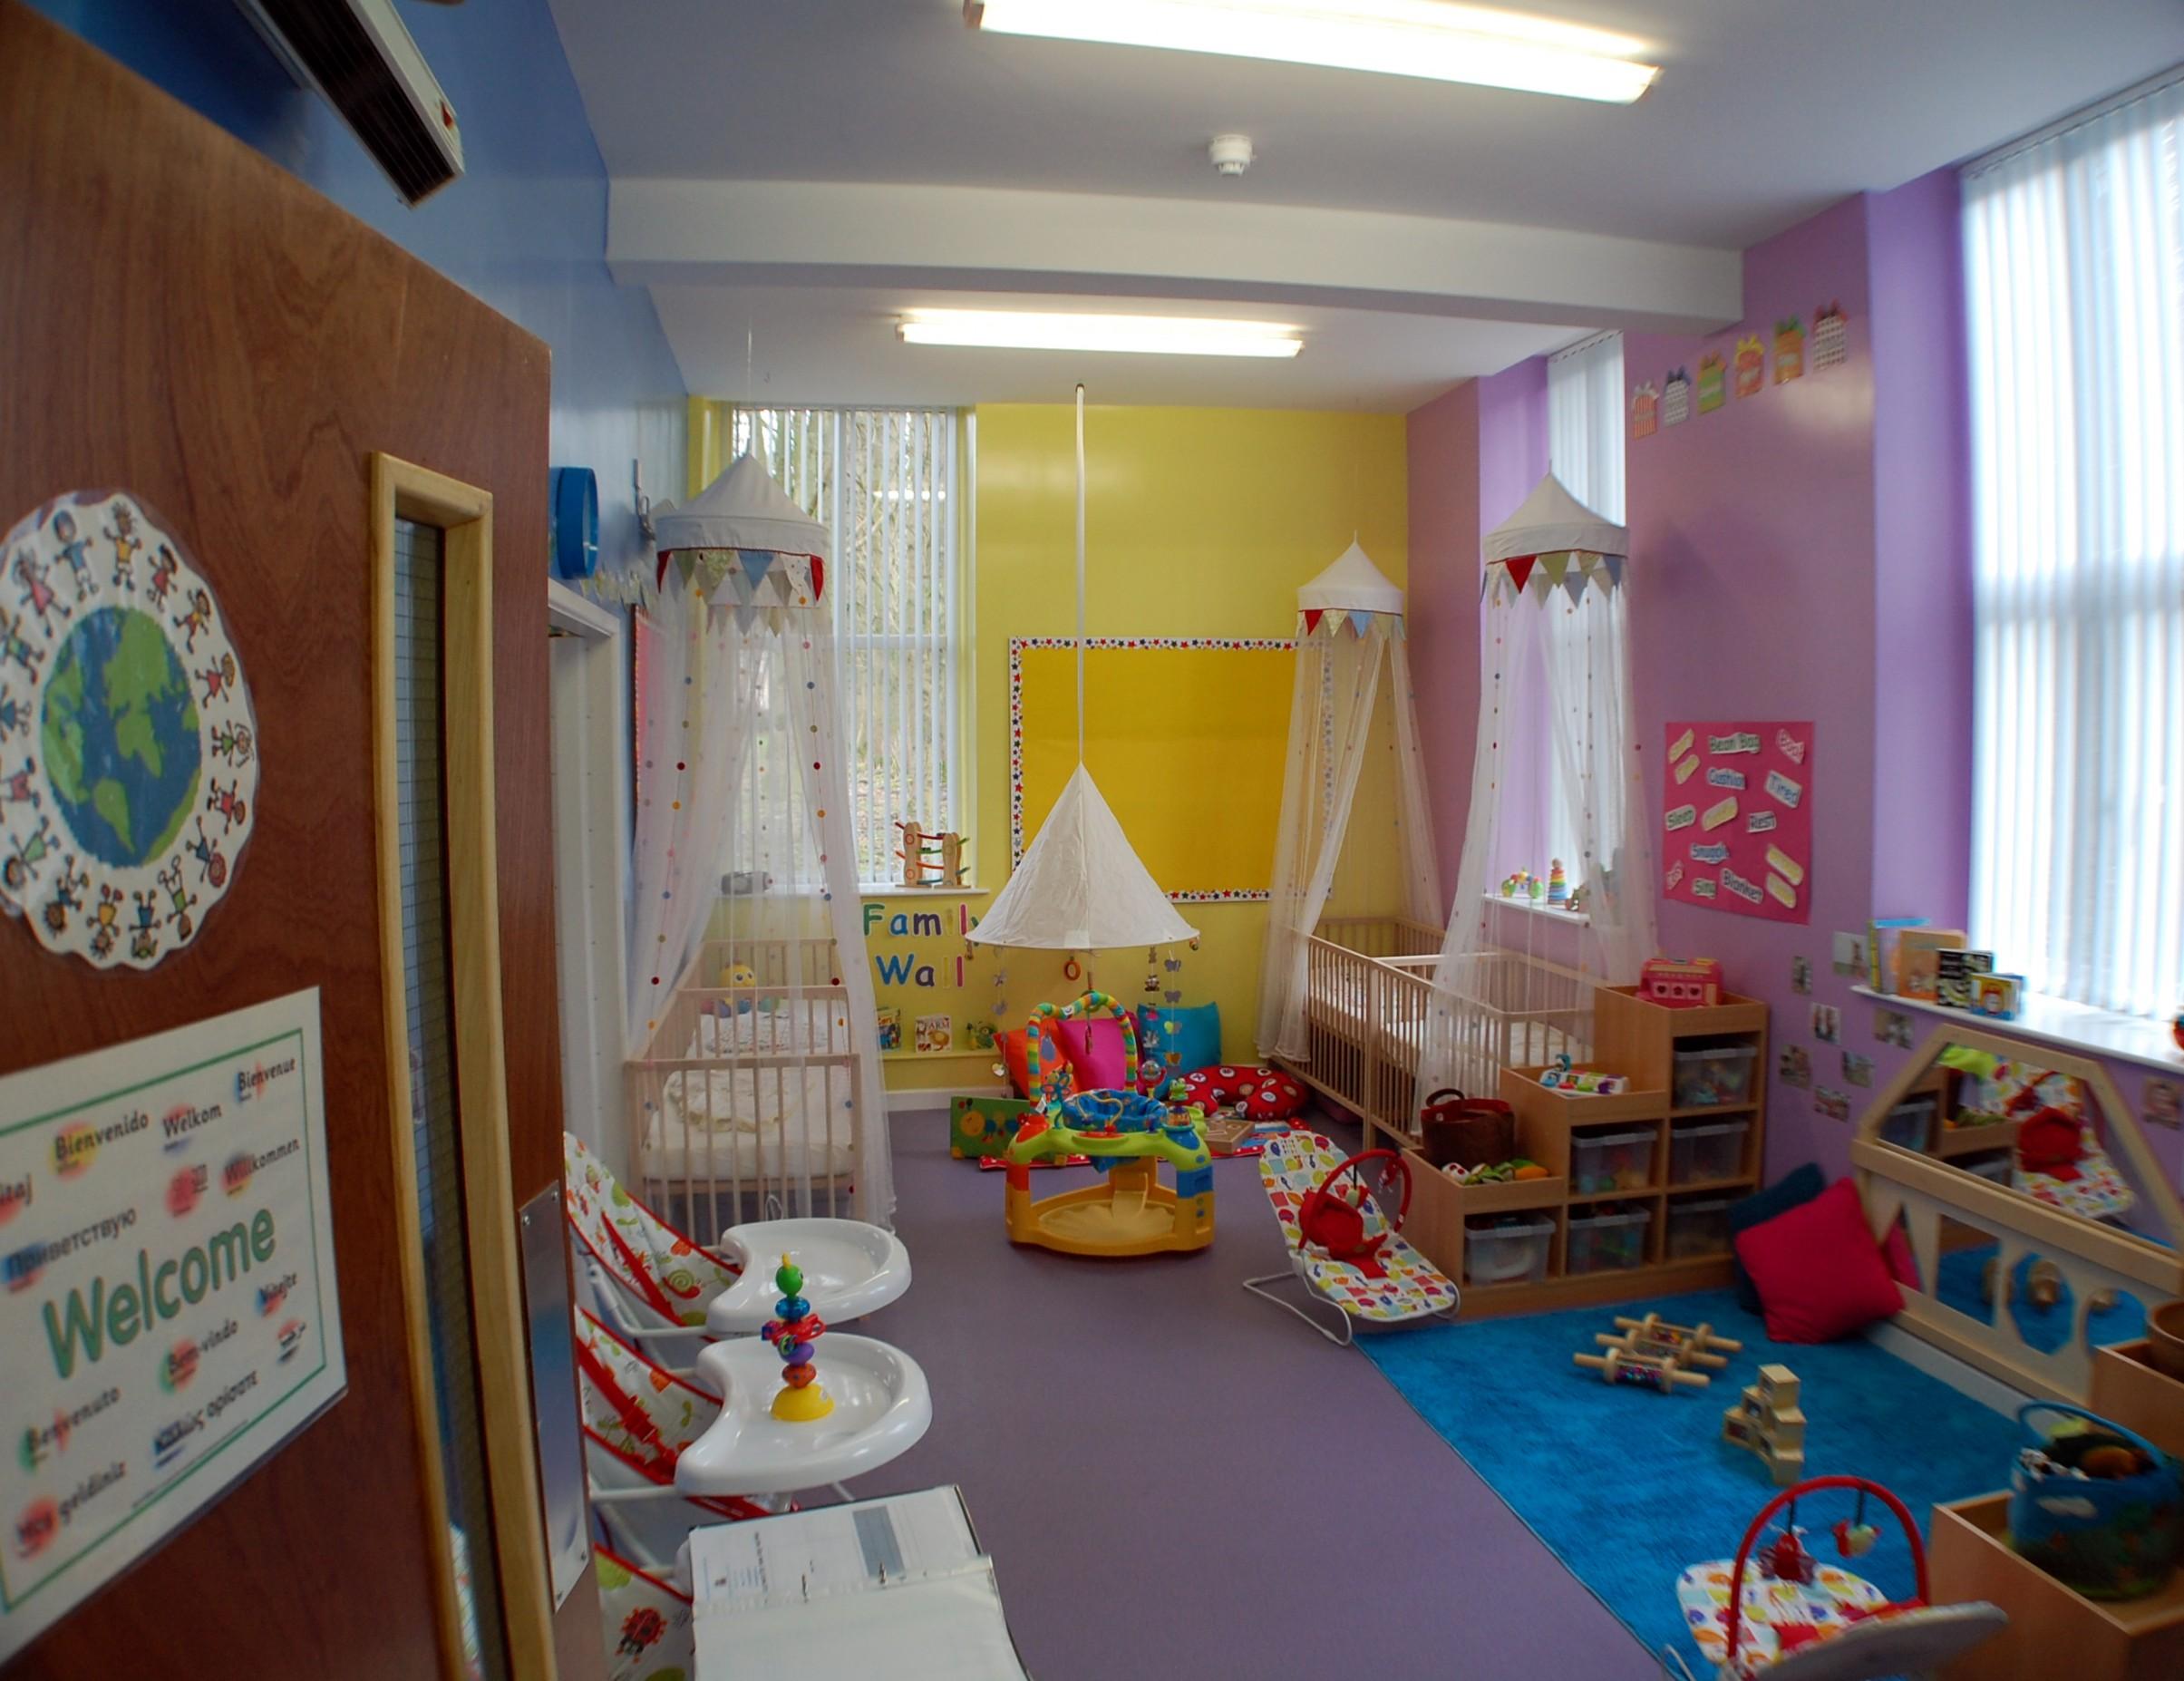 Rooms  Diggle Day Nursery  Oldham - Baby Room Huddersfield